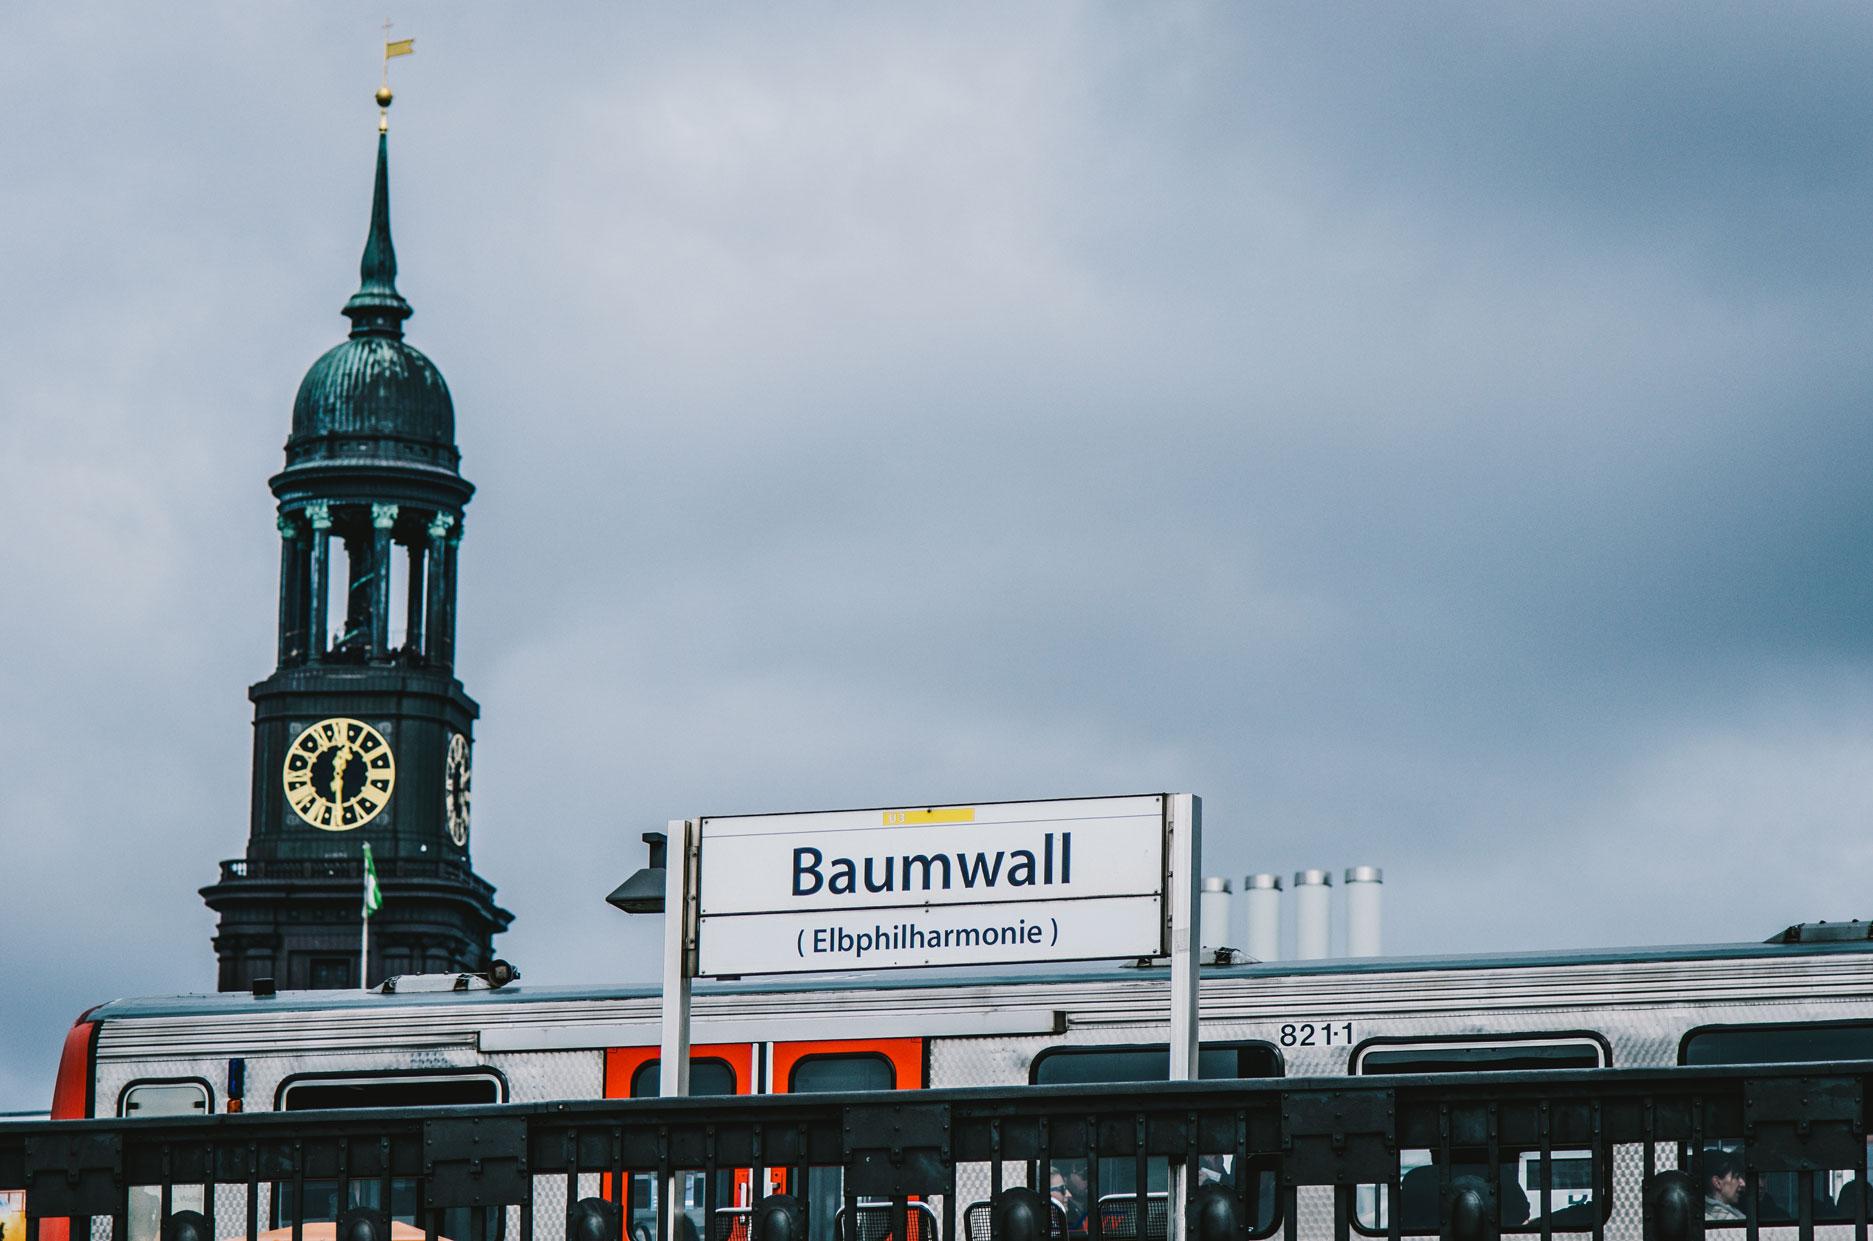 Baumwall